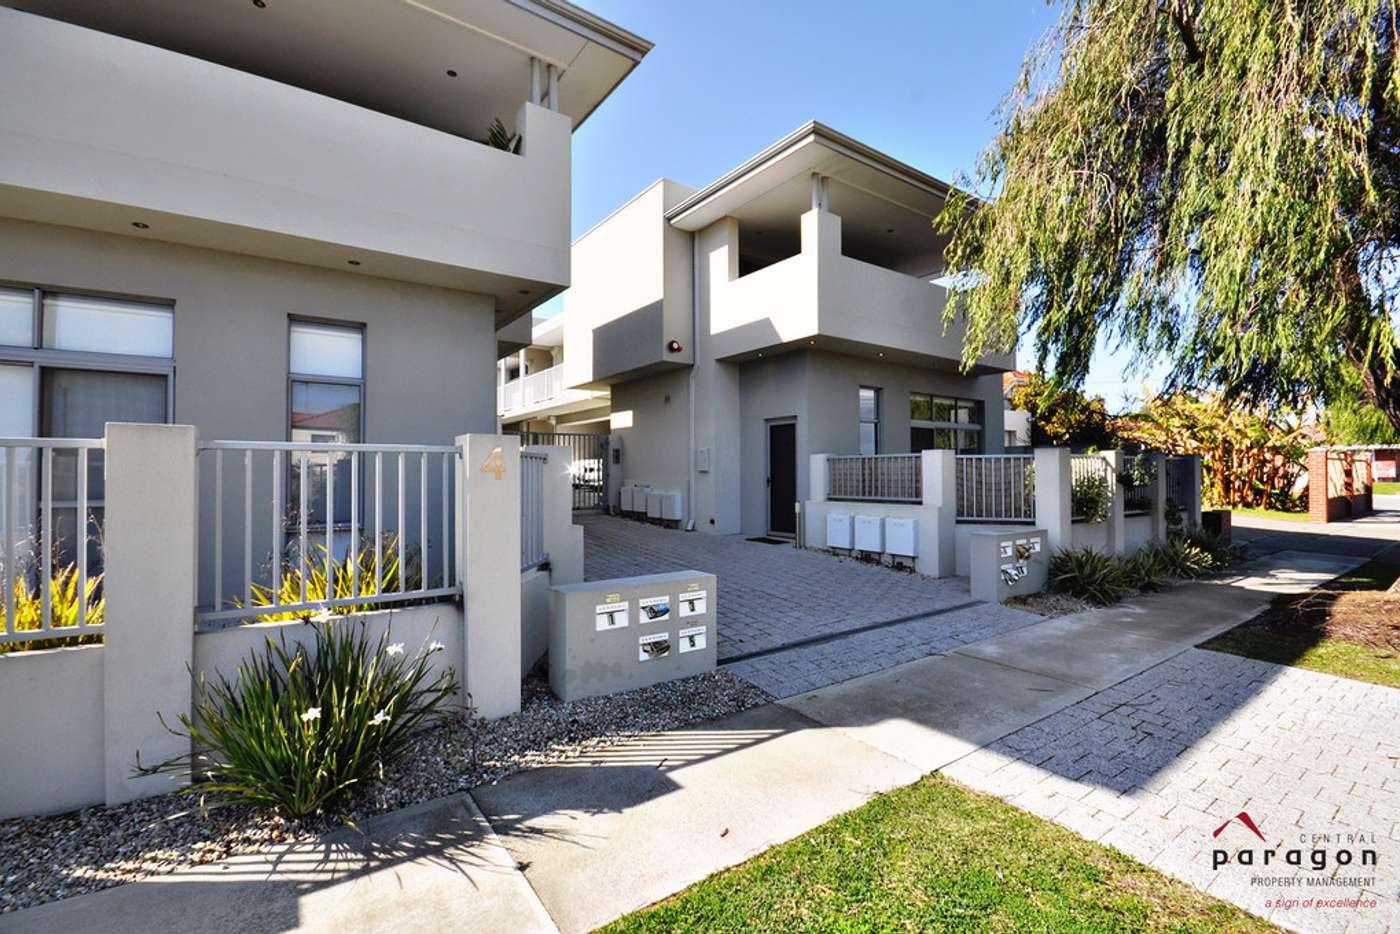 Main view of Homely apartment listing, 1/4 Waterloo Street, Joondanna WA 6060